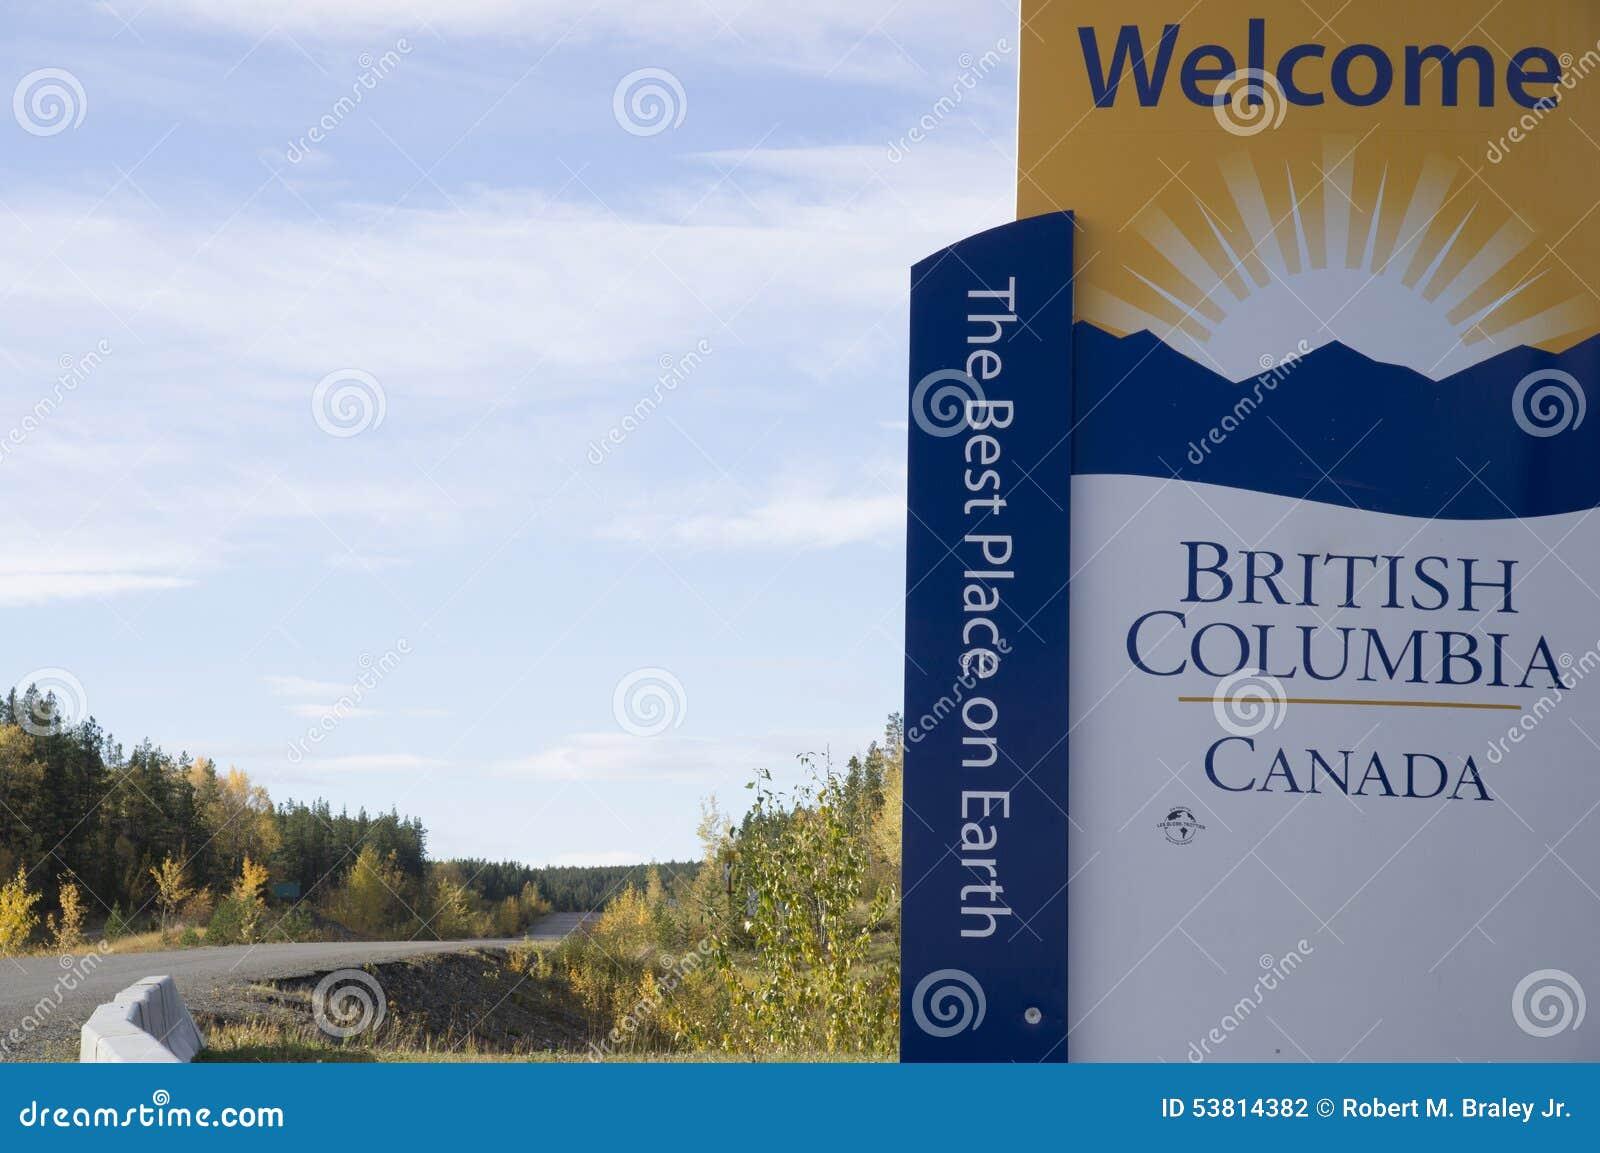 Download British Columbia Canada Welcome Sign Stock Photo - Image of highway, british: 53814382